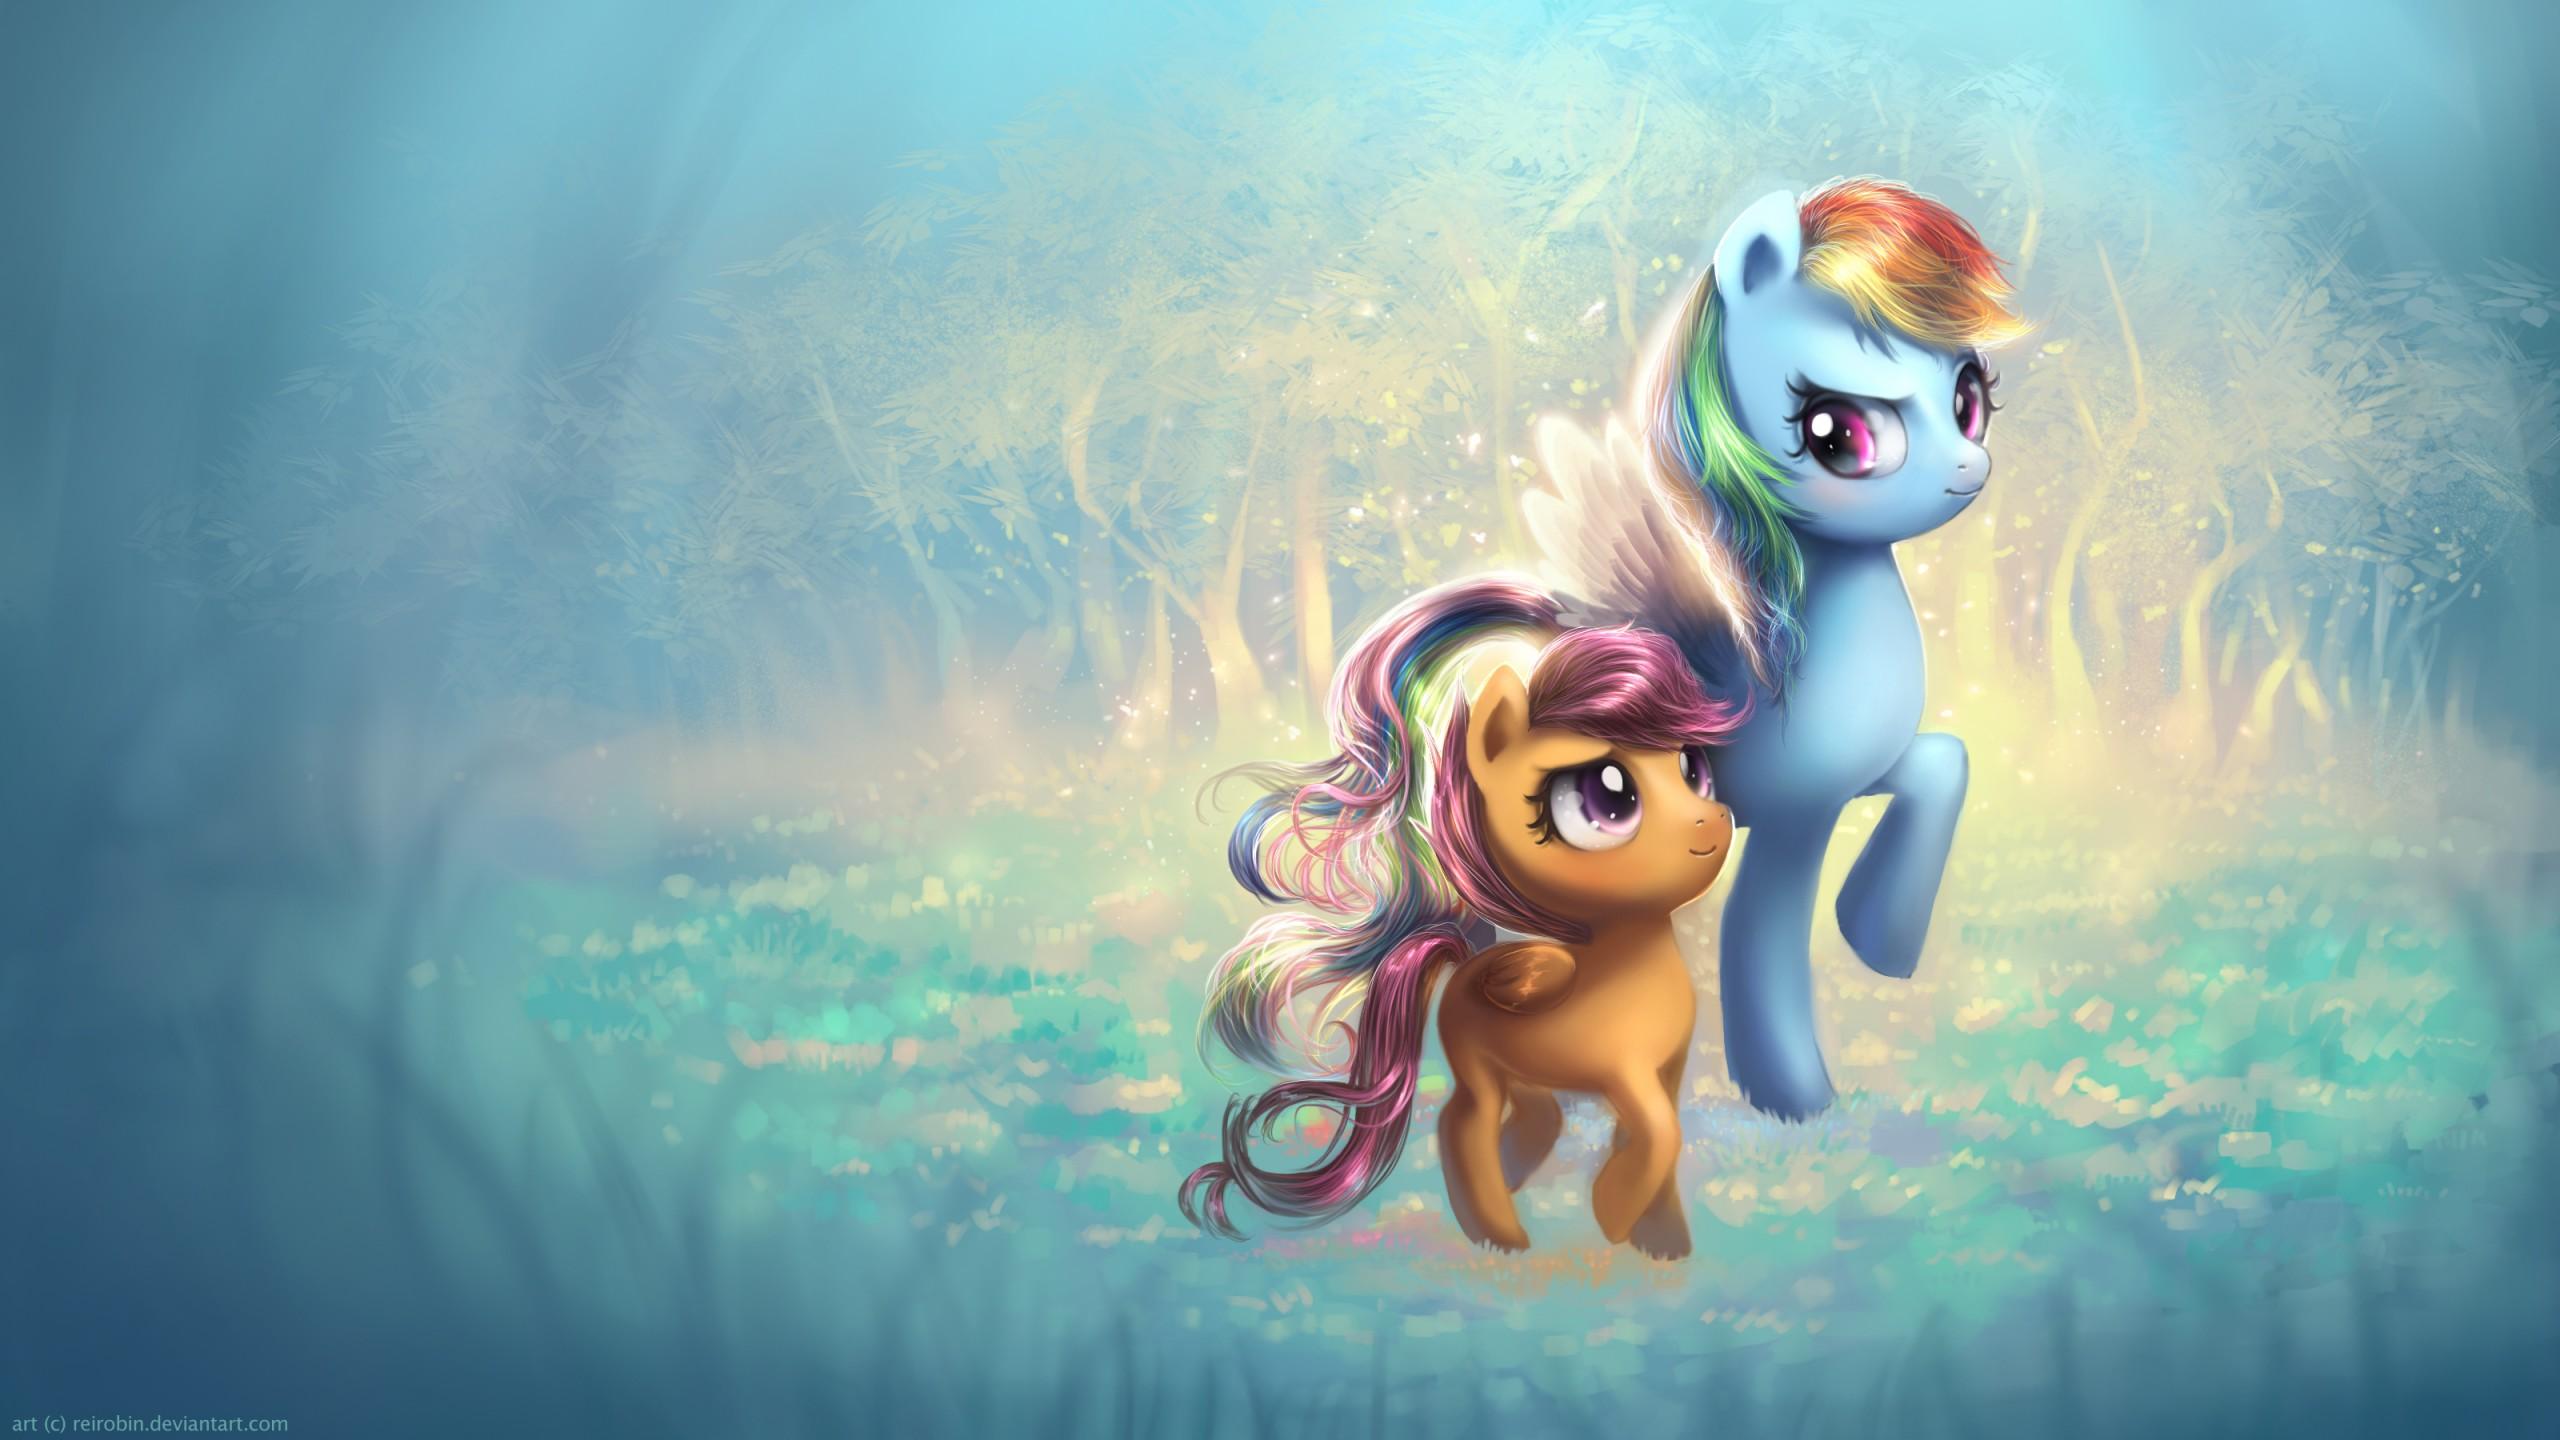 Pastel Cute Wallpaper 1080 Rainbow Wing Ponyville Ponies Wallpapers Hd Wallpapers